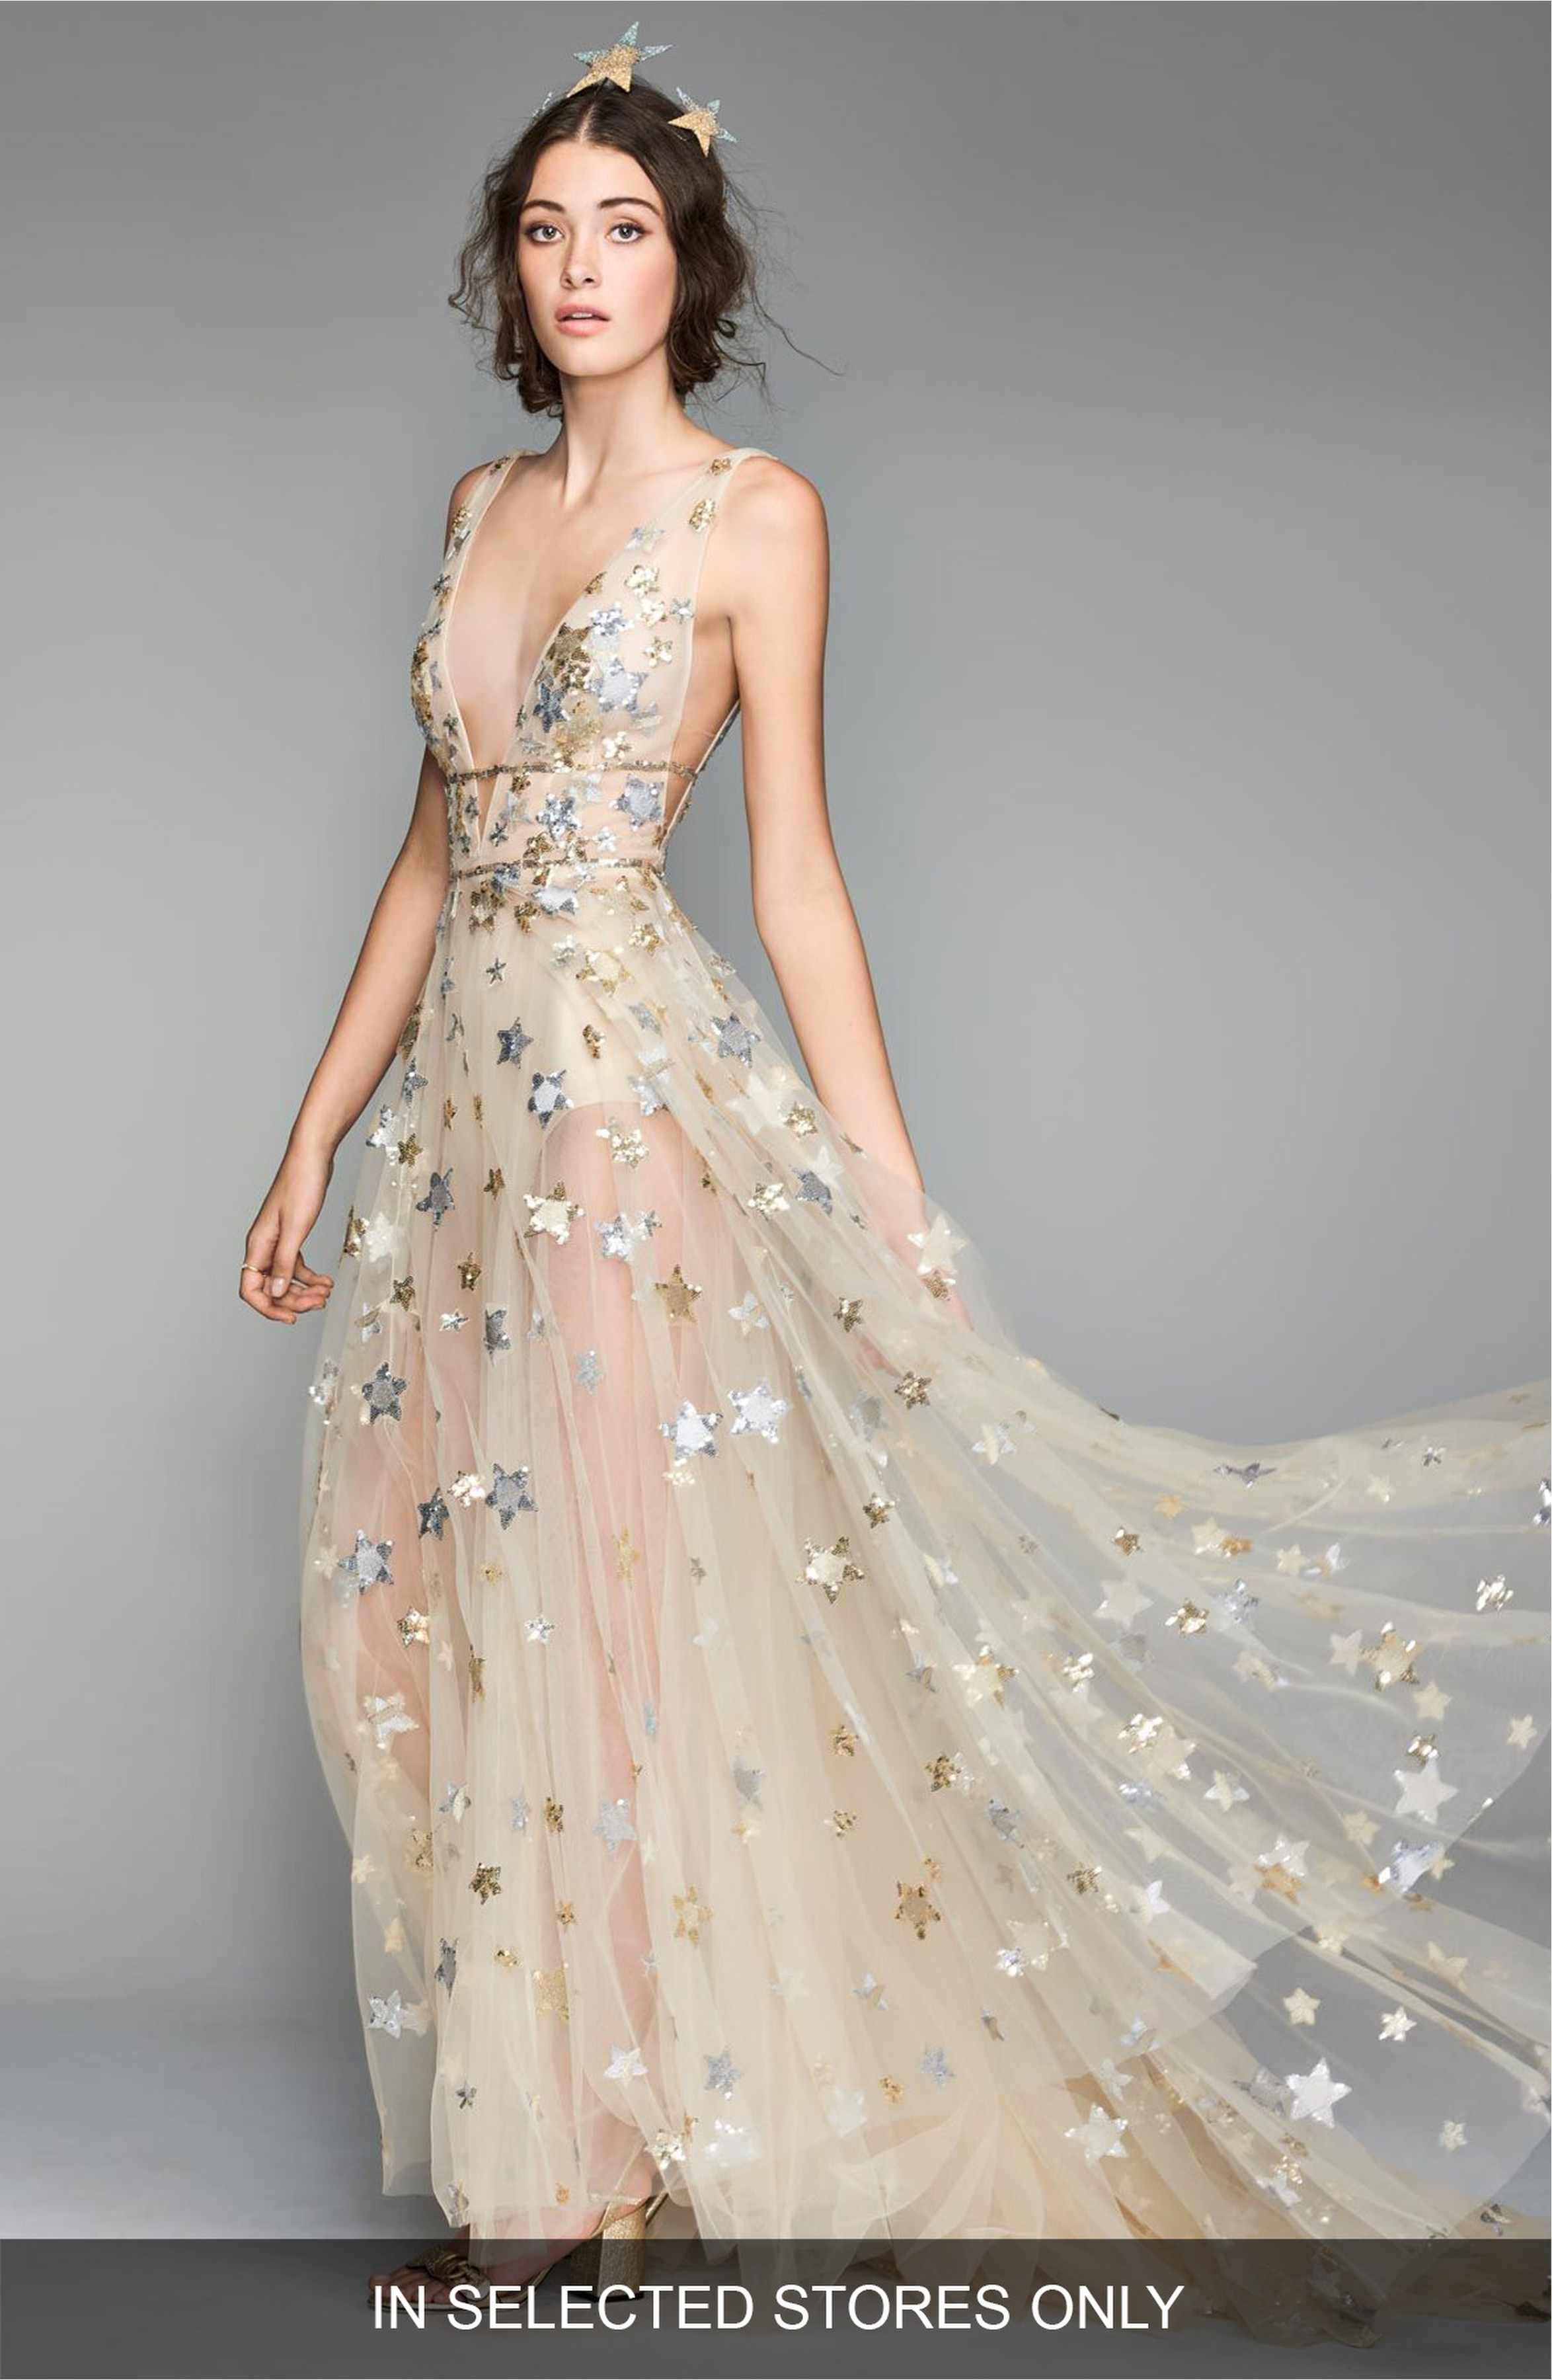 Boho bohemian star print stars sheer wedding dress ethereal